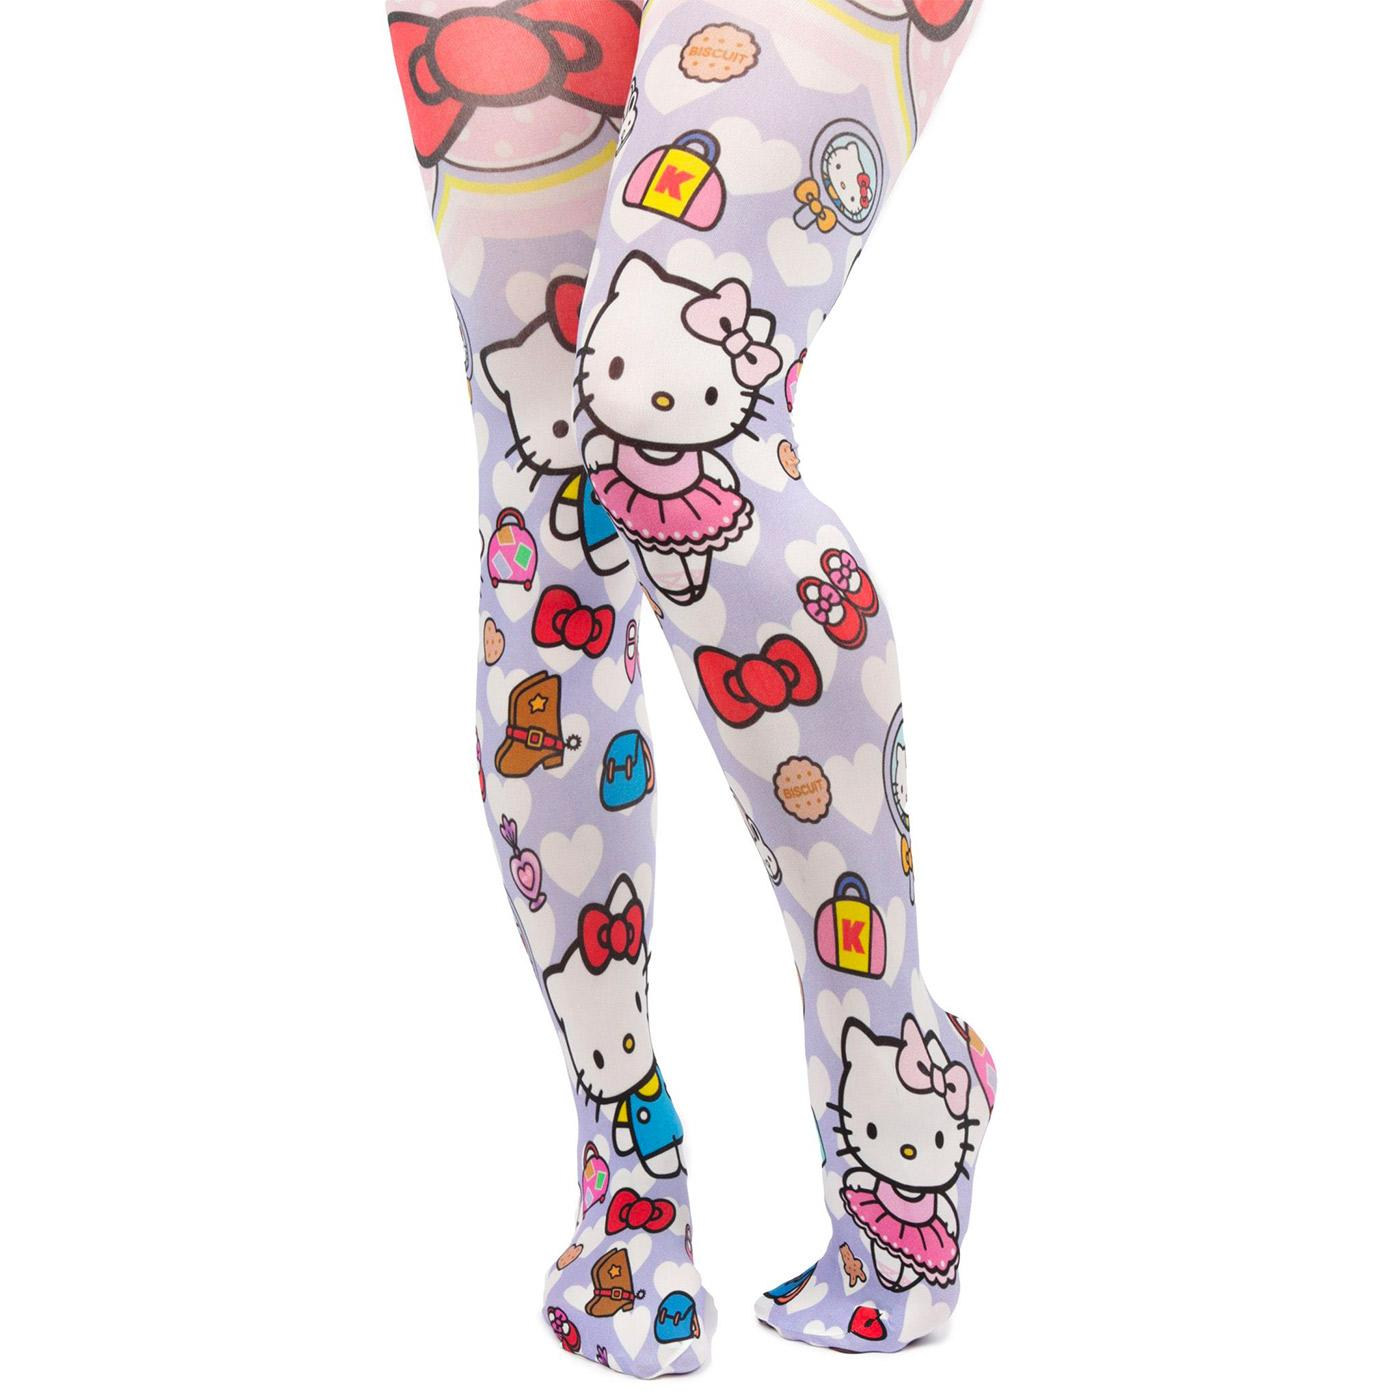 IRREGULAR CHOICE x HELLO KITTY Dress Up Tights